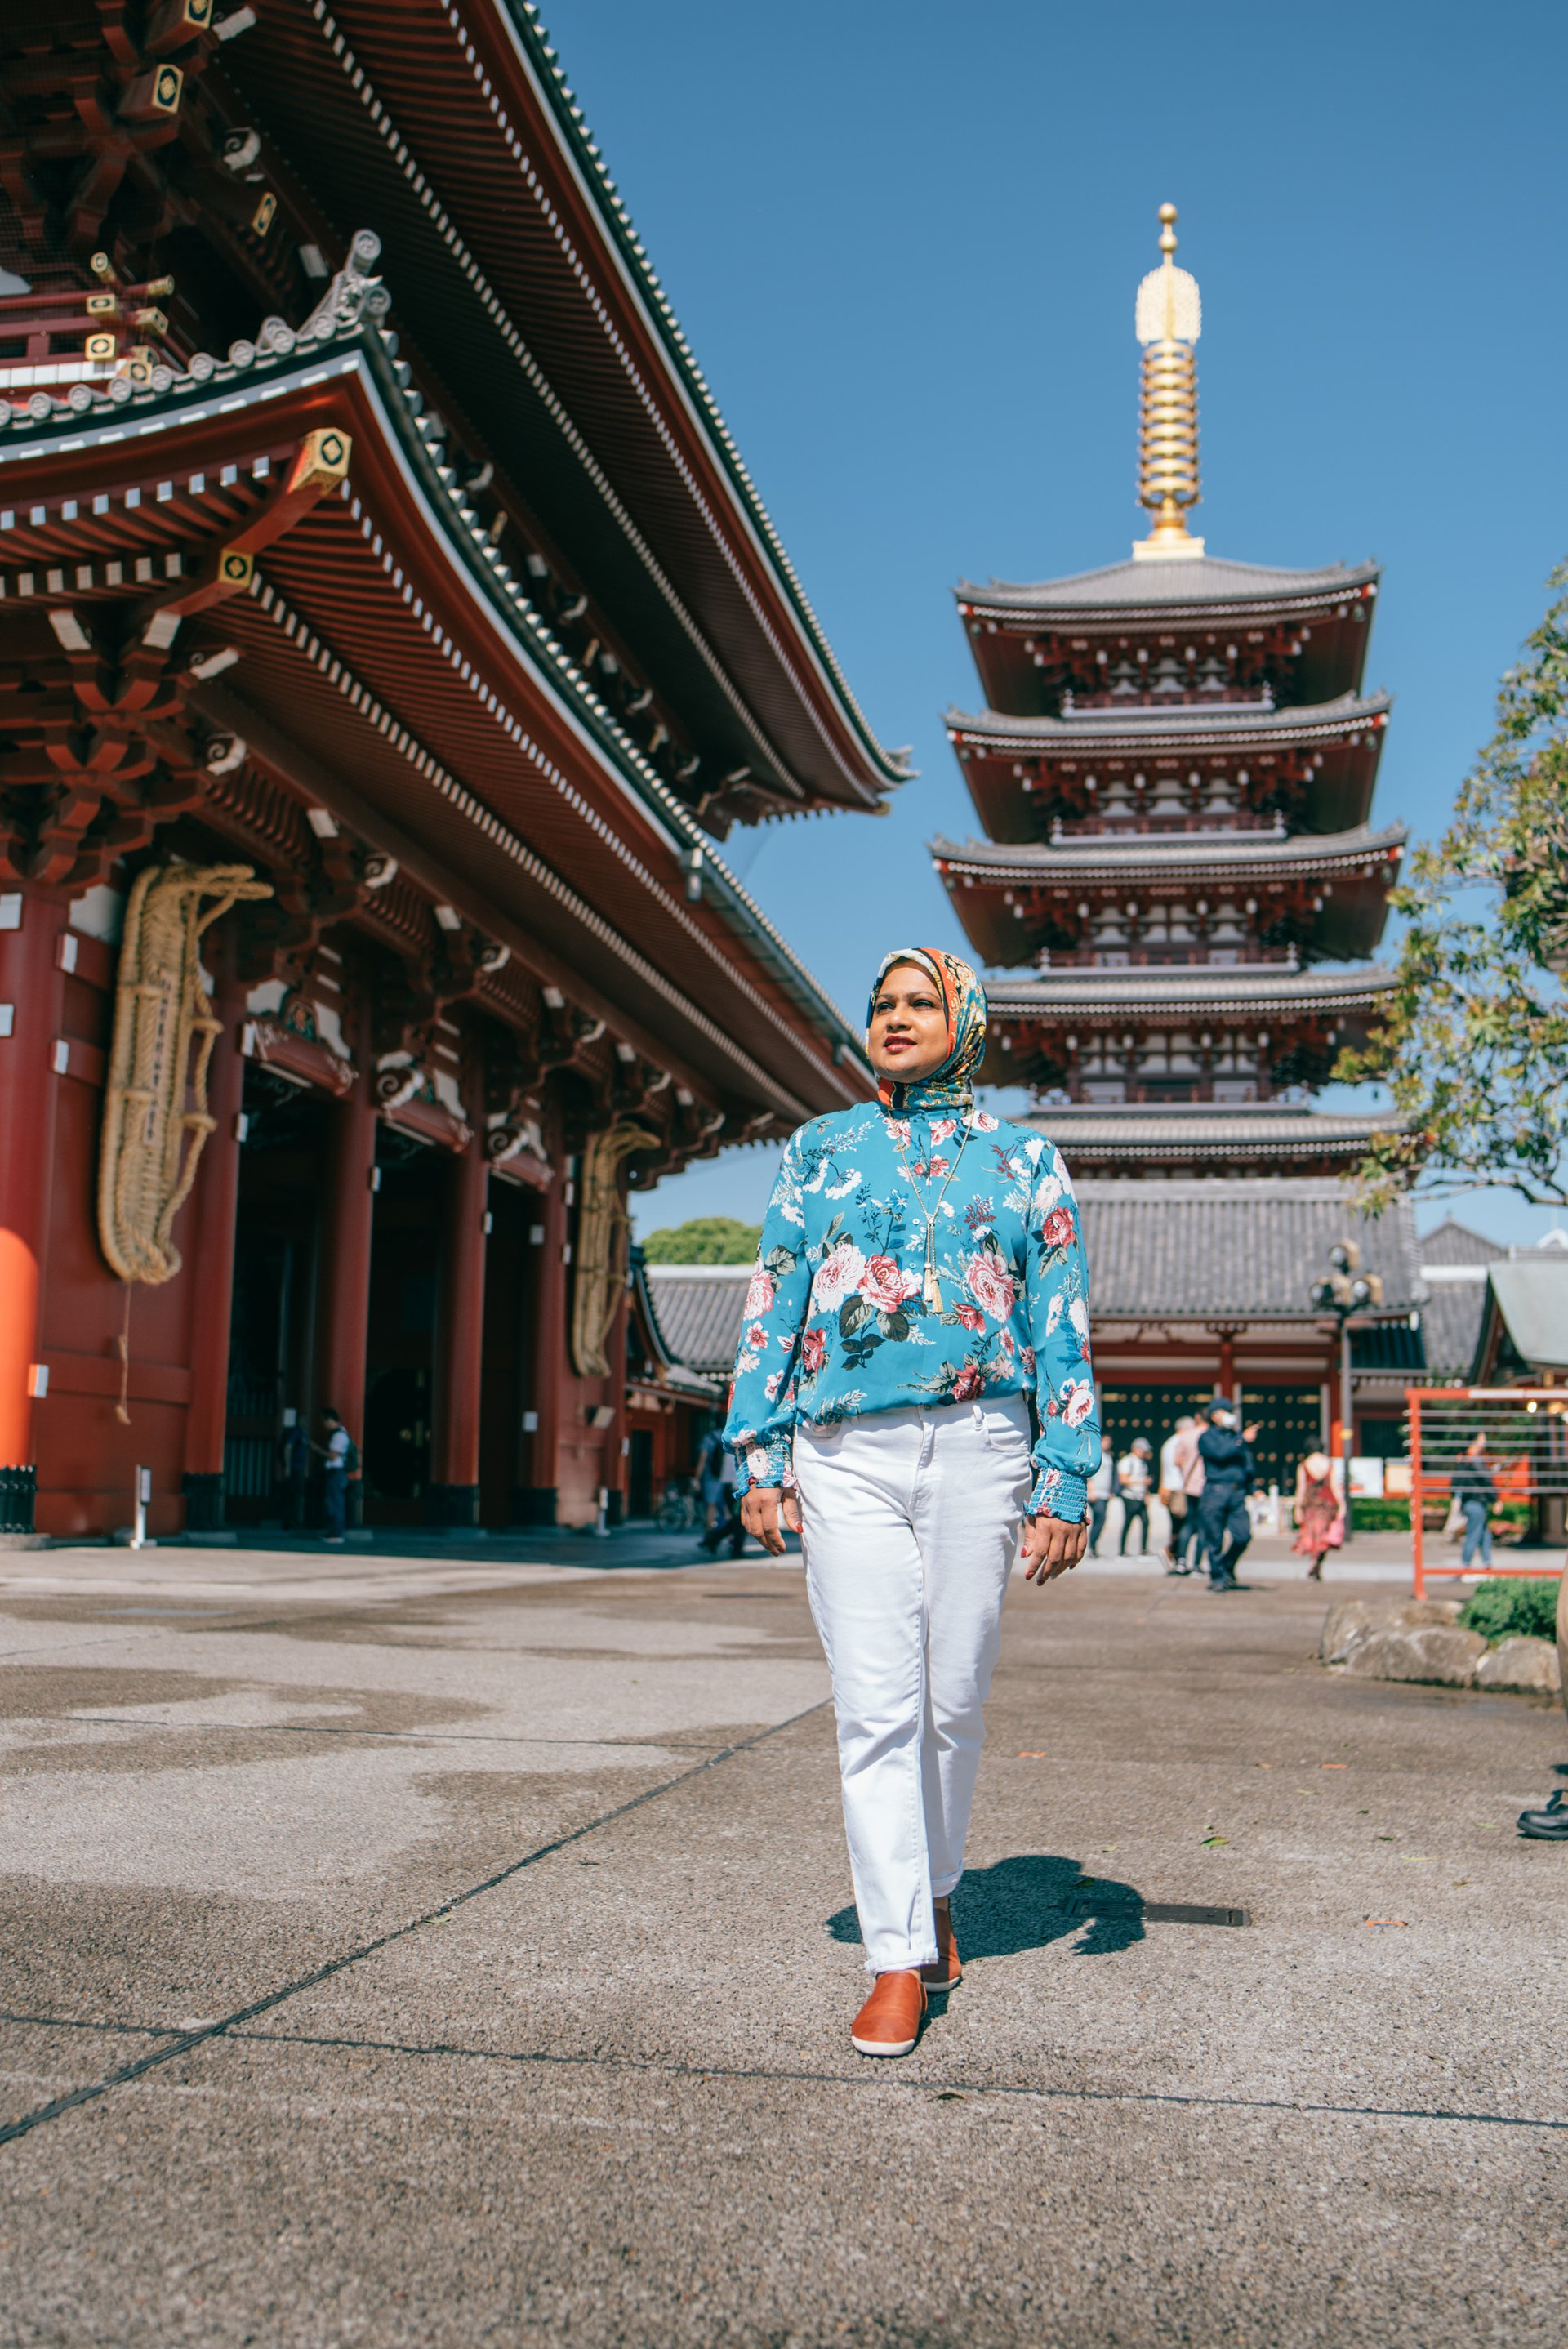 Tokyo-Japan-travel-story-Flytographer-5